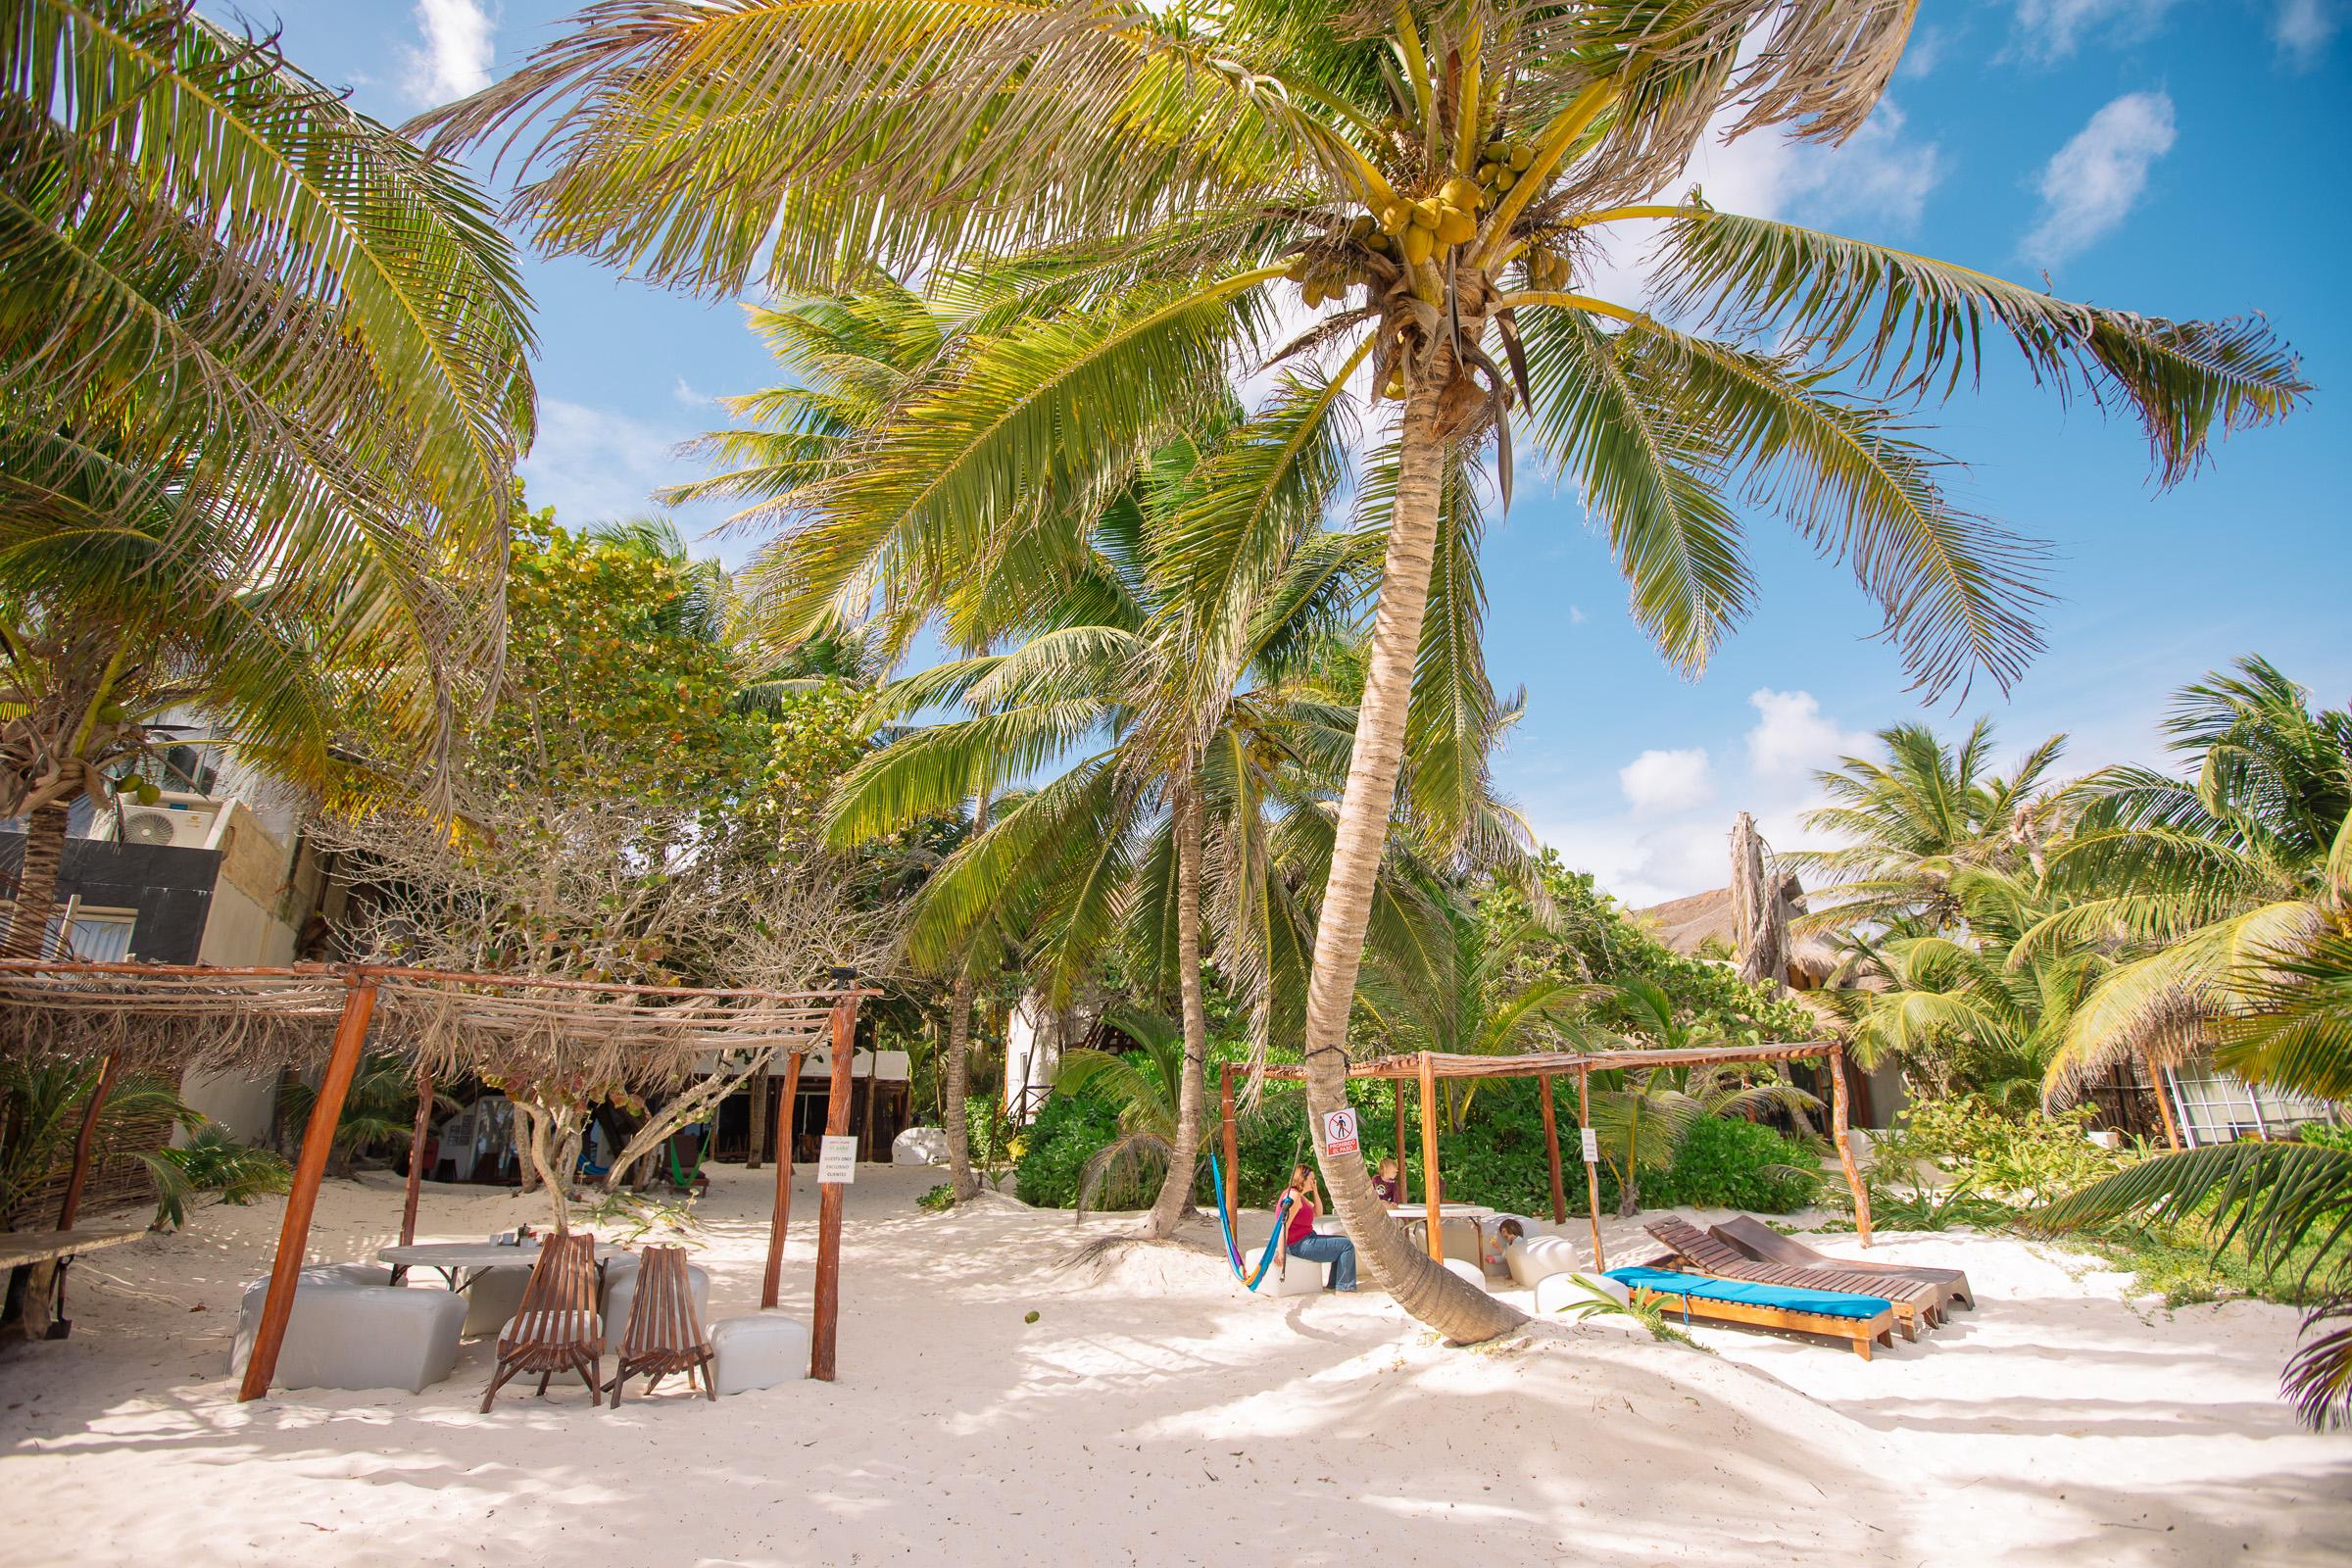 Blick zu den cabañas der Playa Xcanan